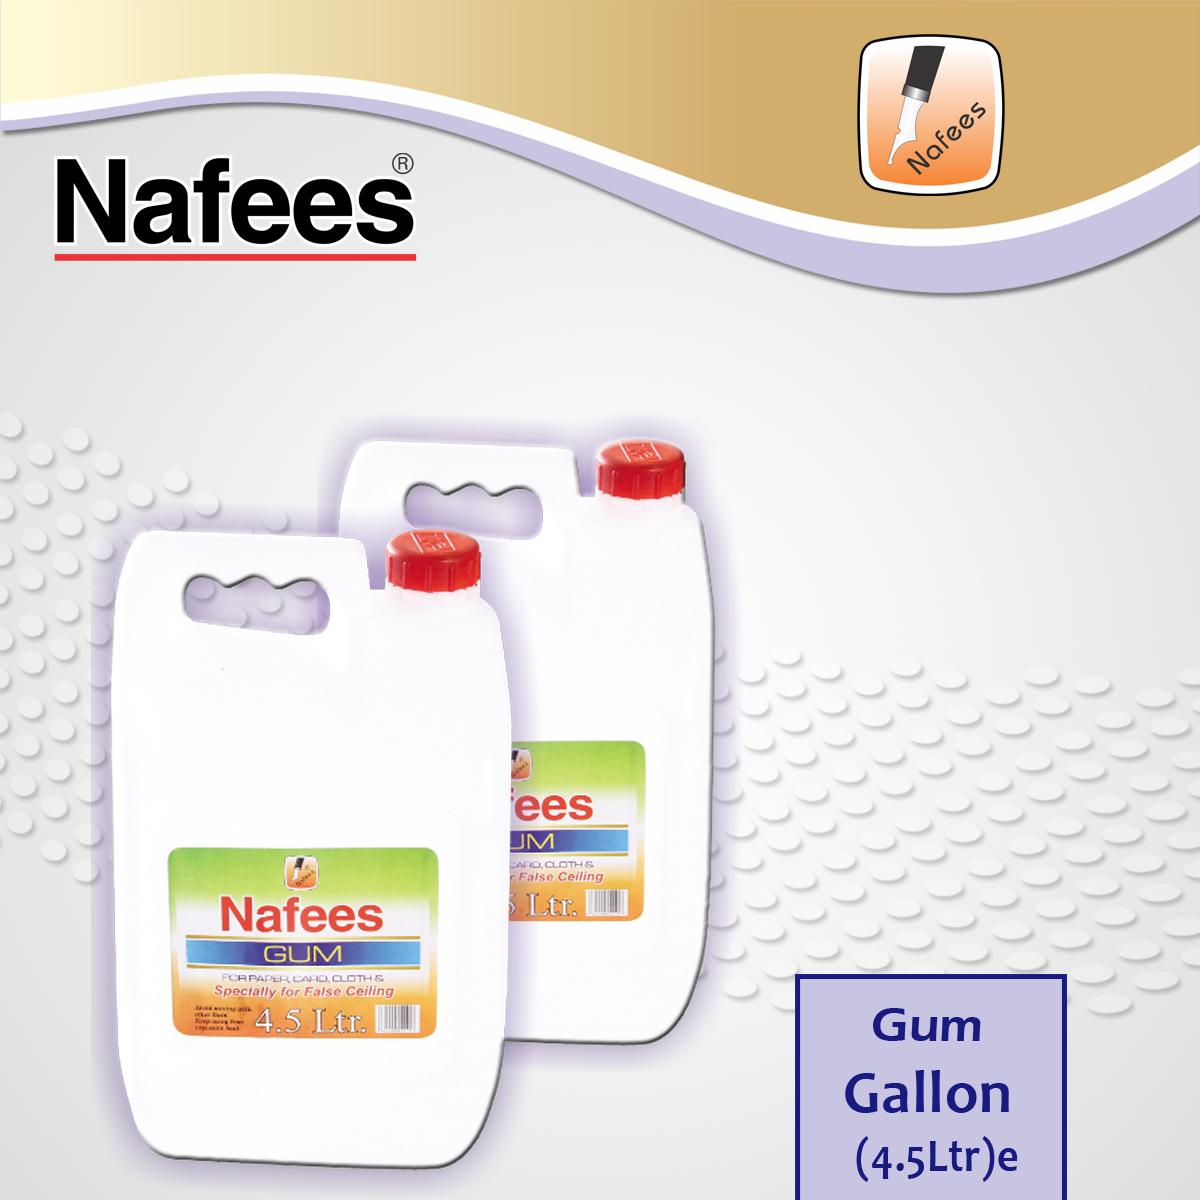 Gum Gallon (4.5 Ltr)